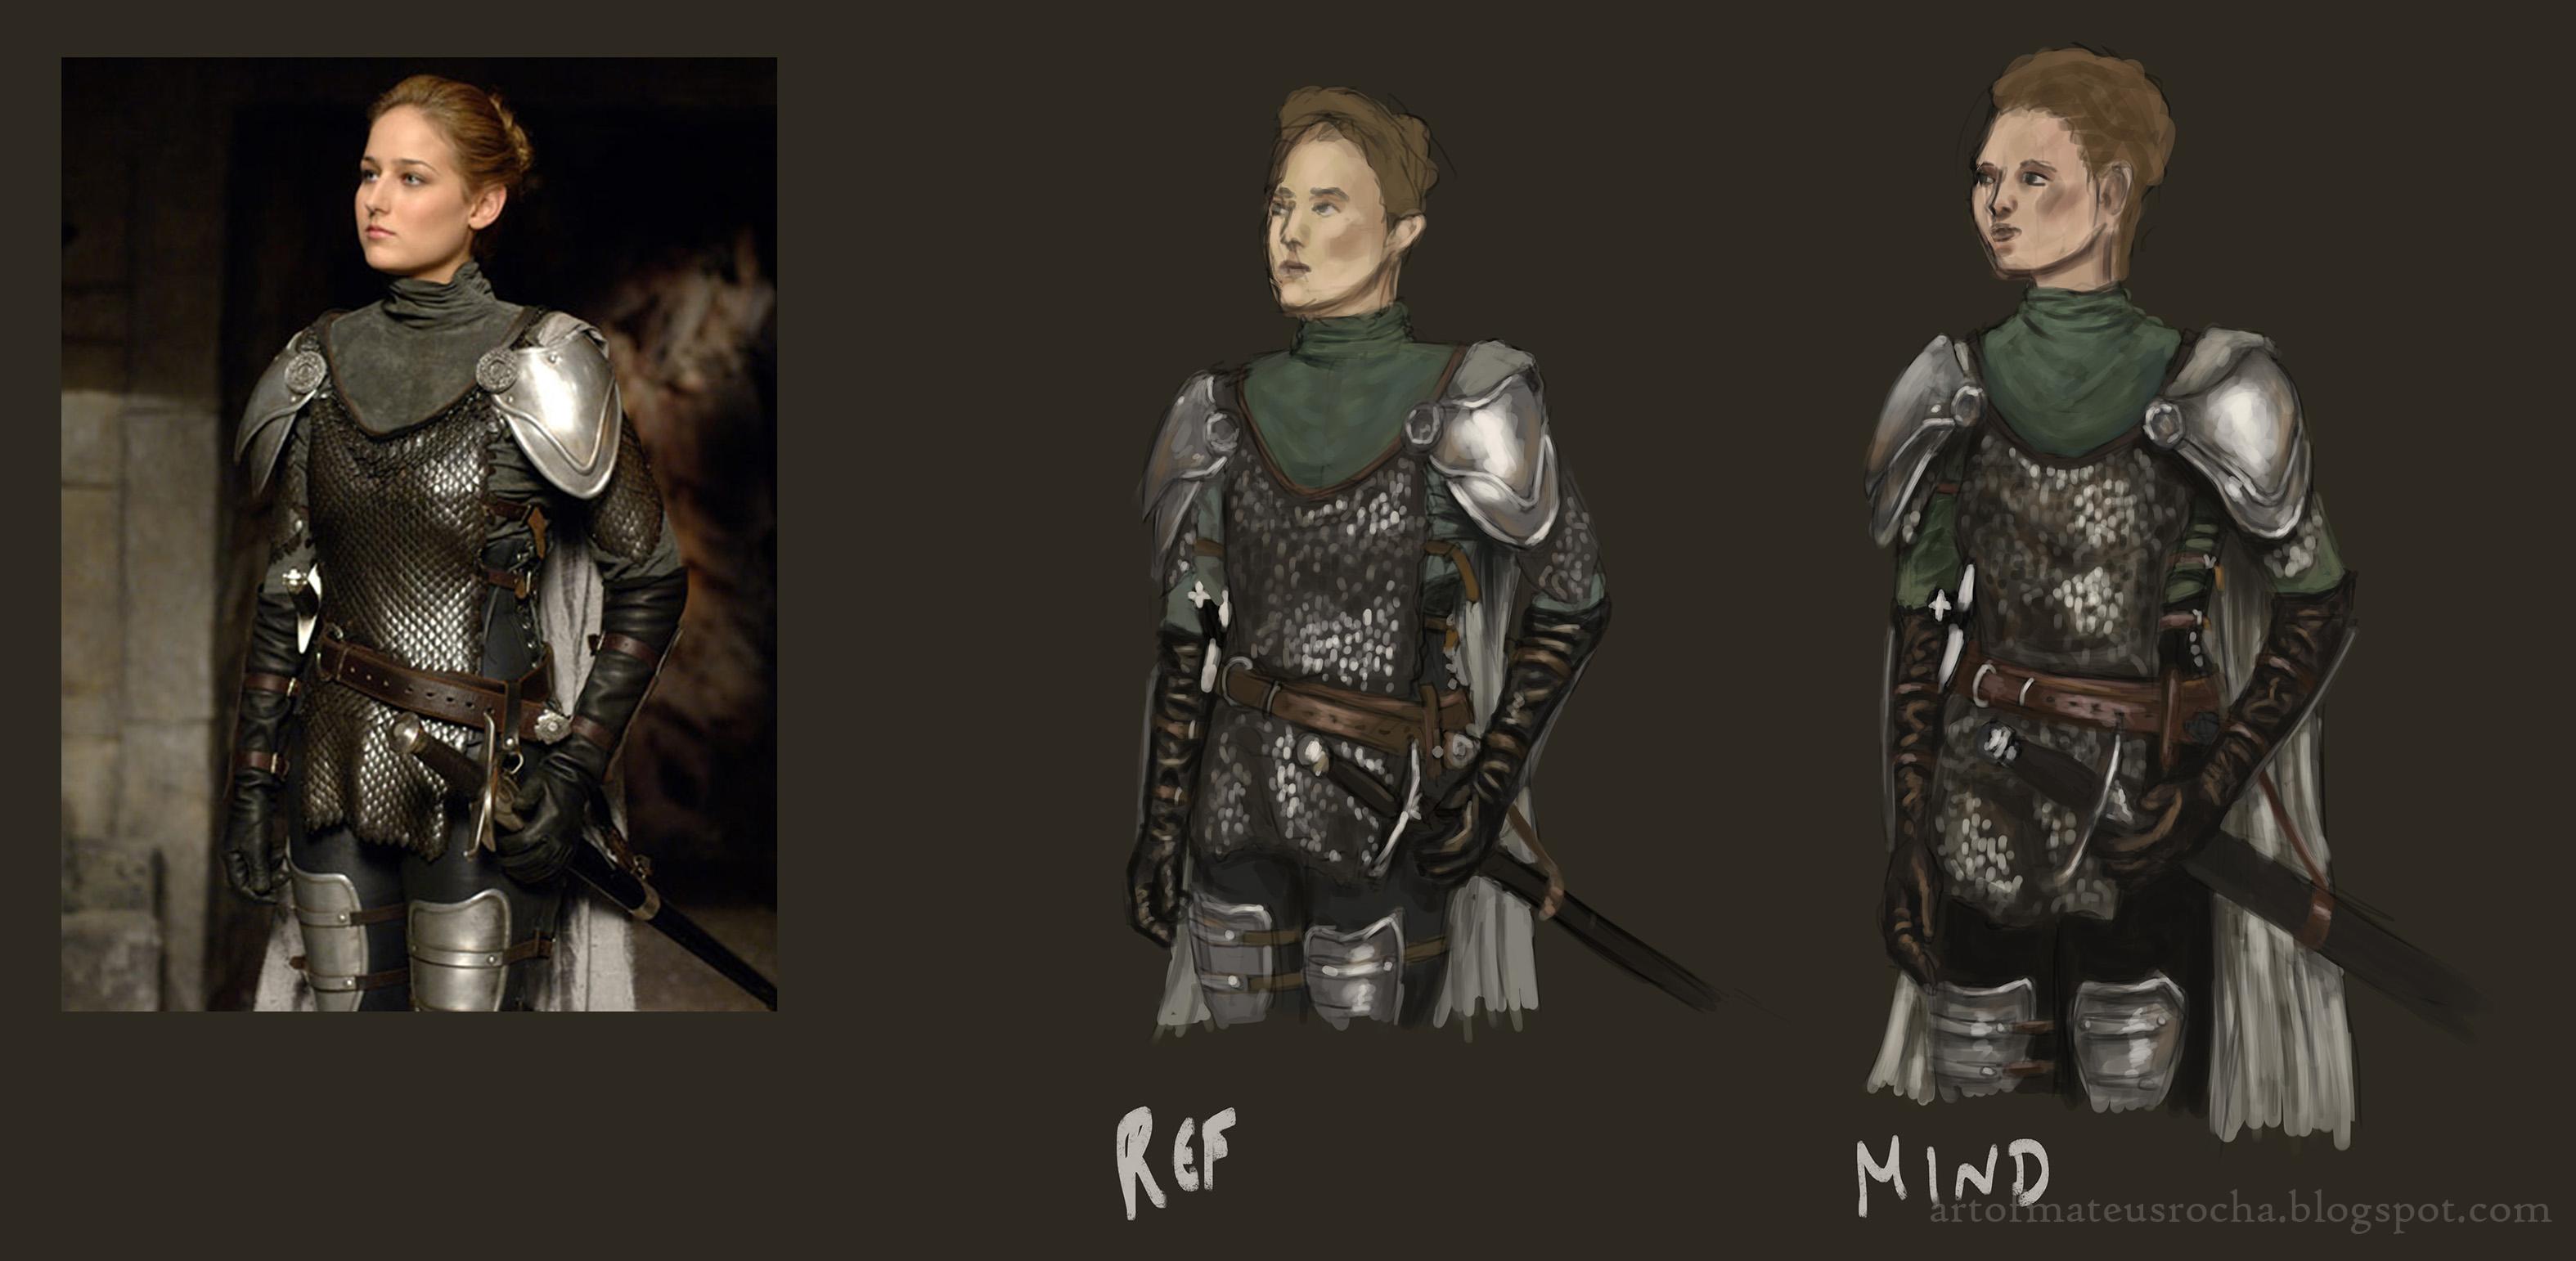 [Image: 05_07_13_armor_practice_by_mateusrocha-d6c6gdj.jpg]